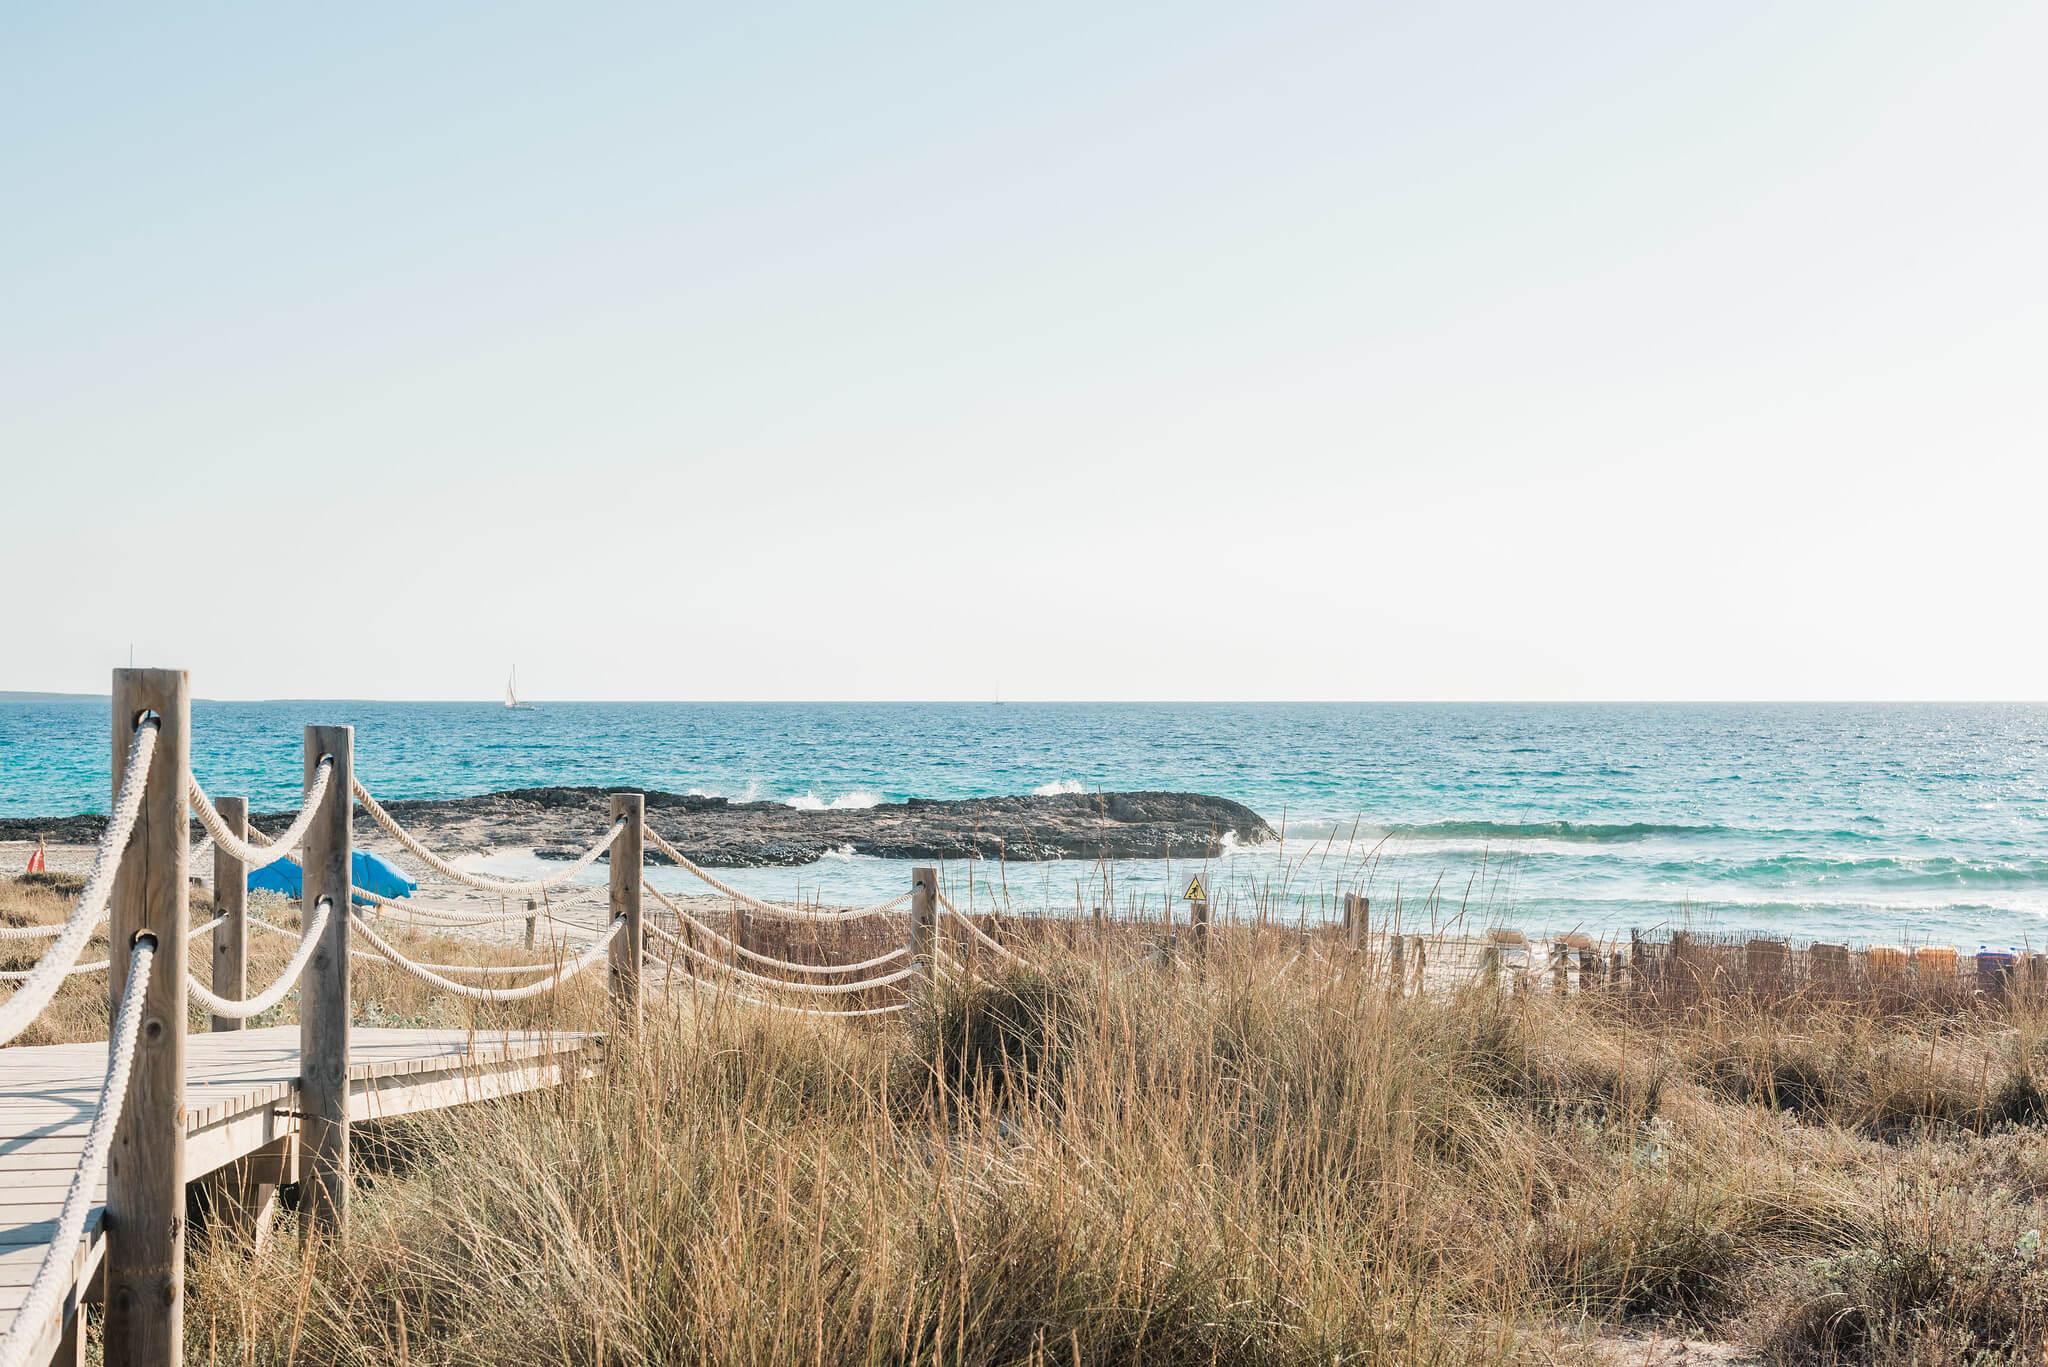 https://www.white-ibiza.com/wp-content/uploads/2020/03/formentera-beaches-es-caval-den-borras-2020-01.jpg